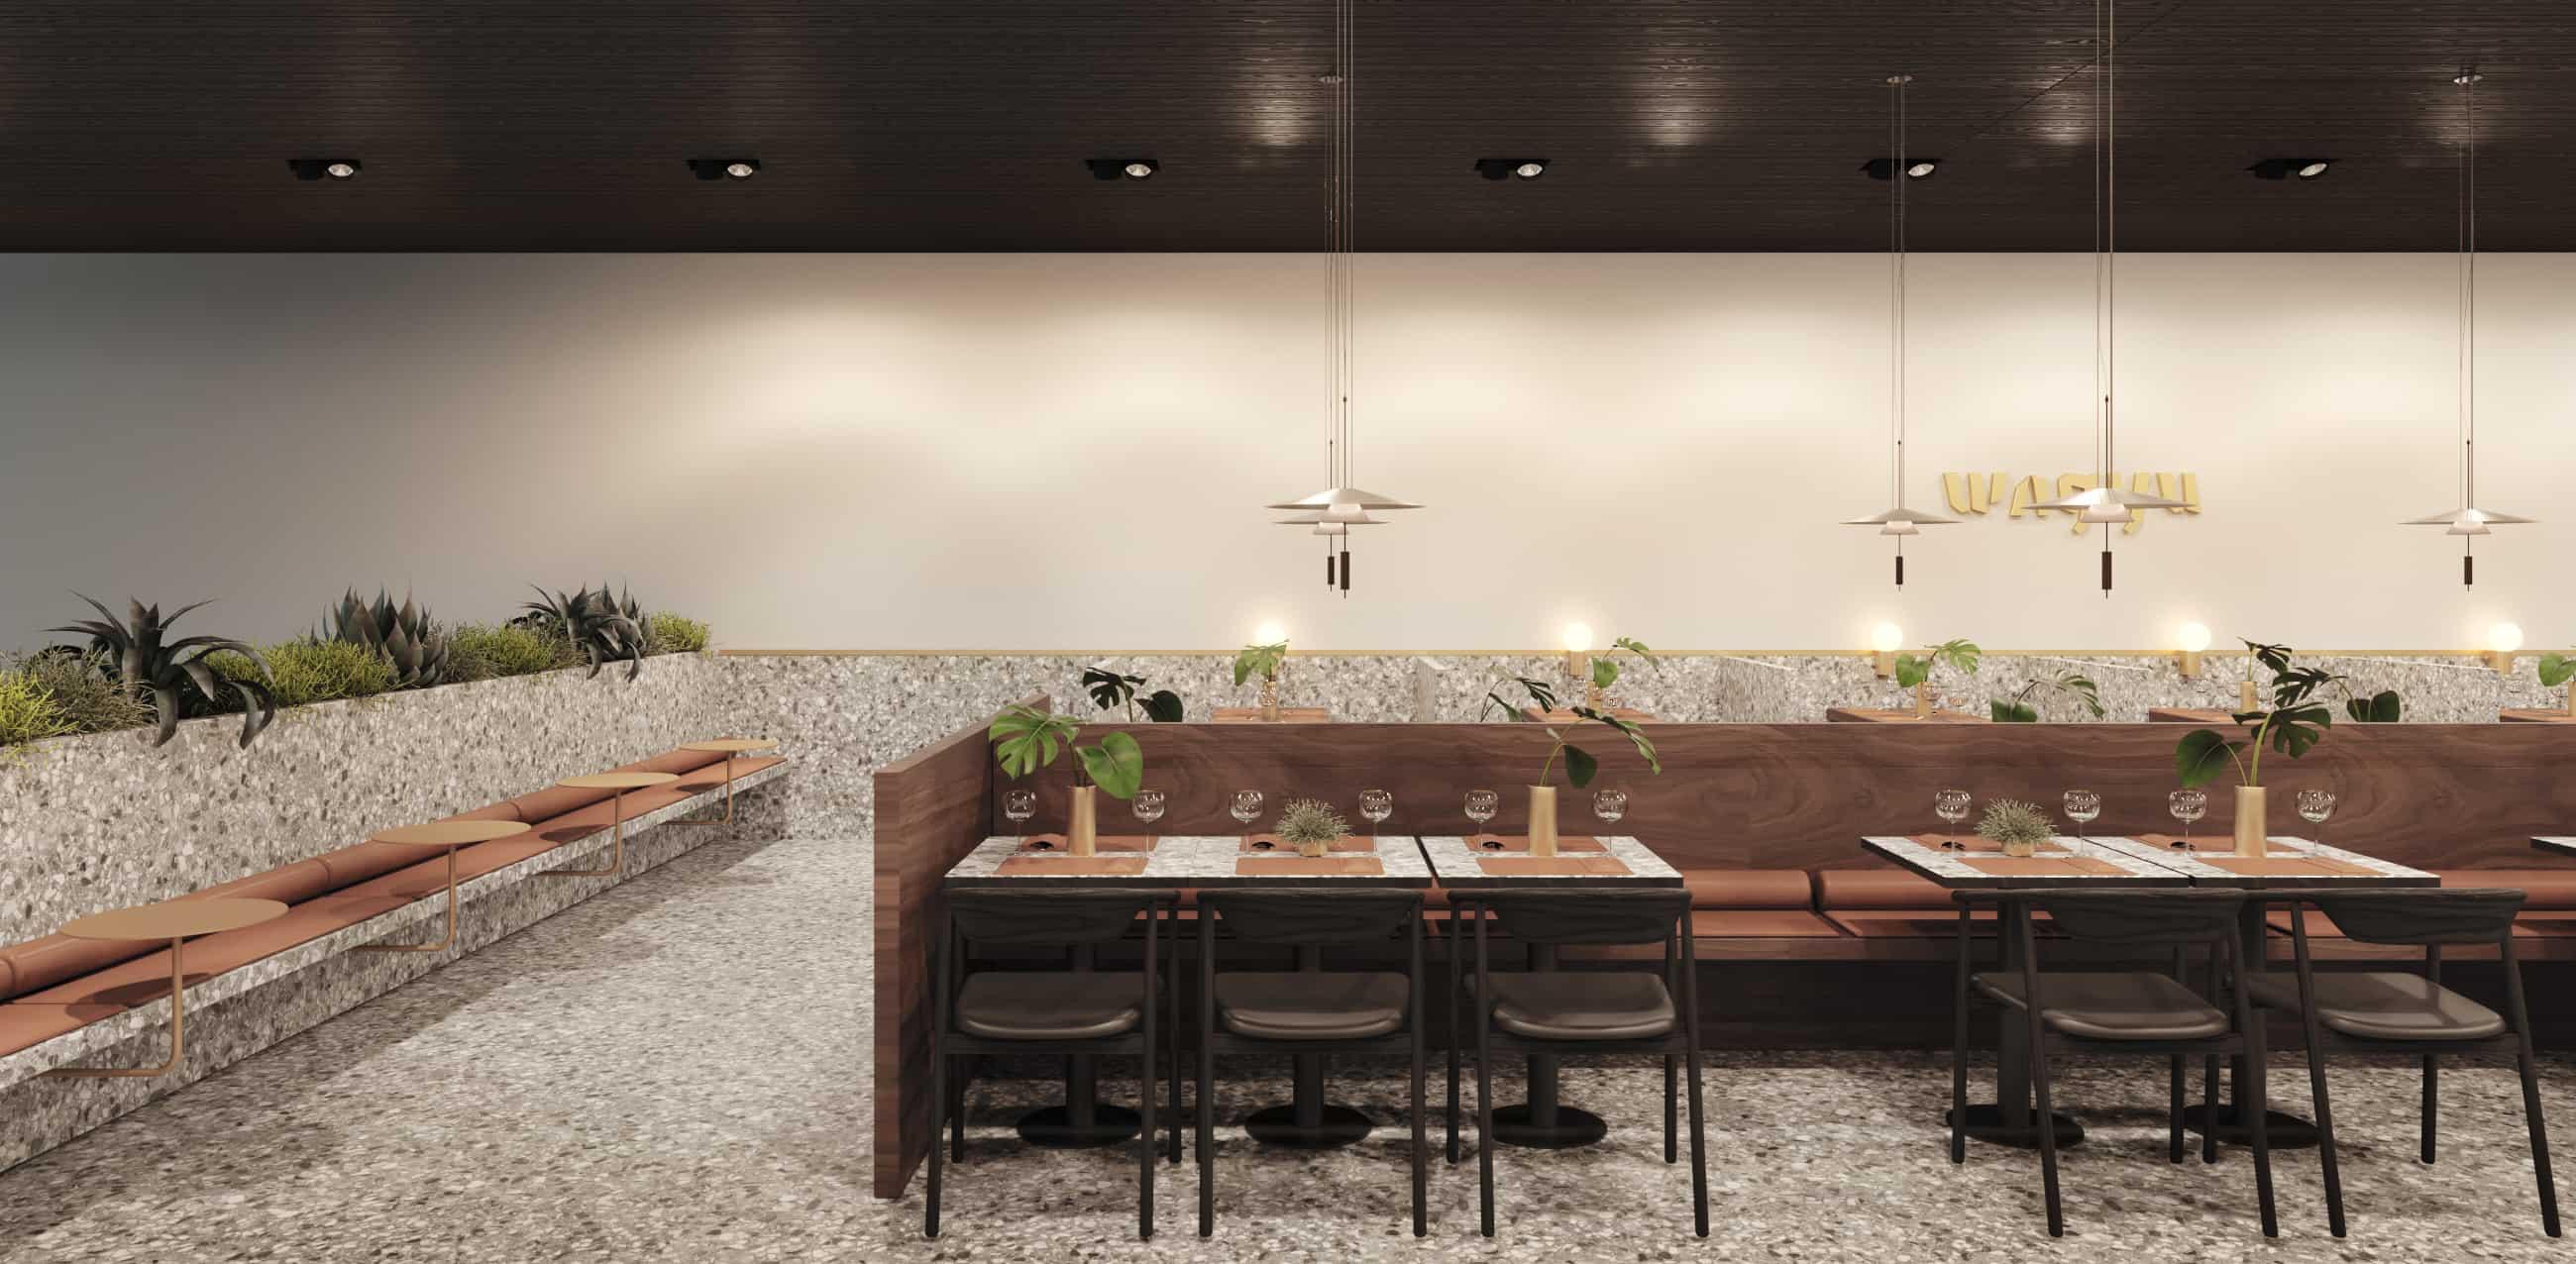 Restaurant design 14 (1)